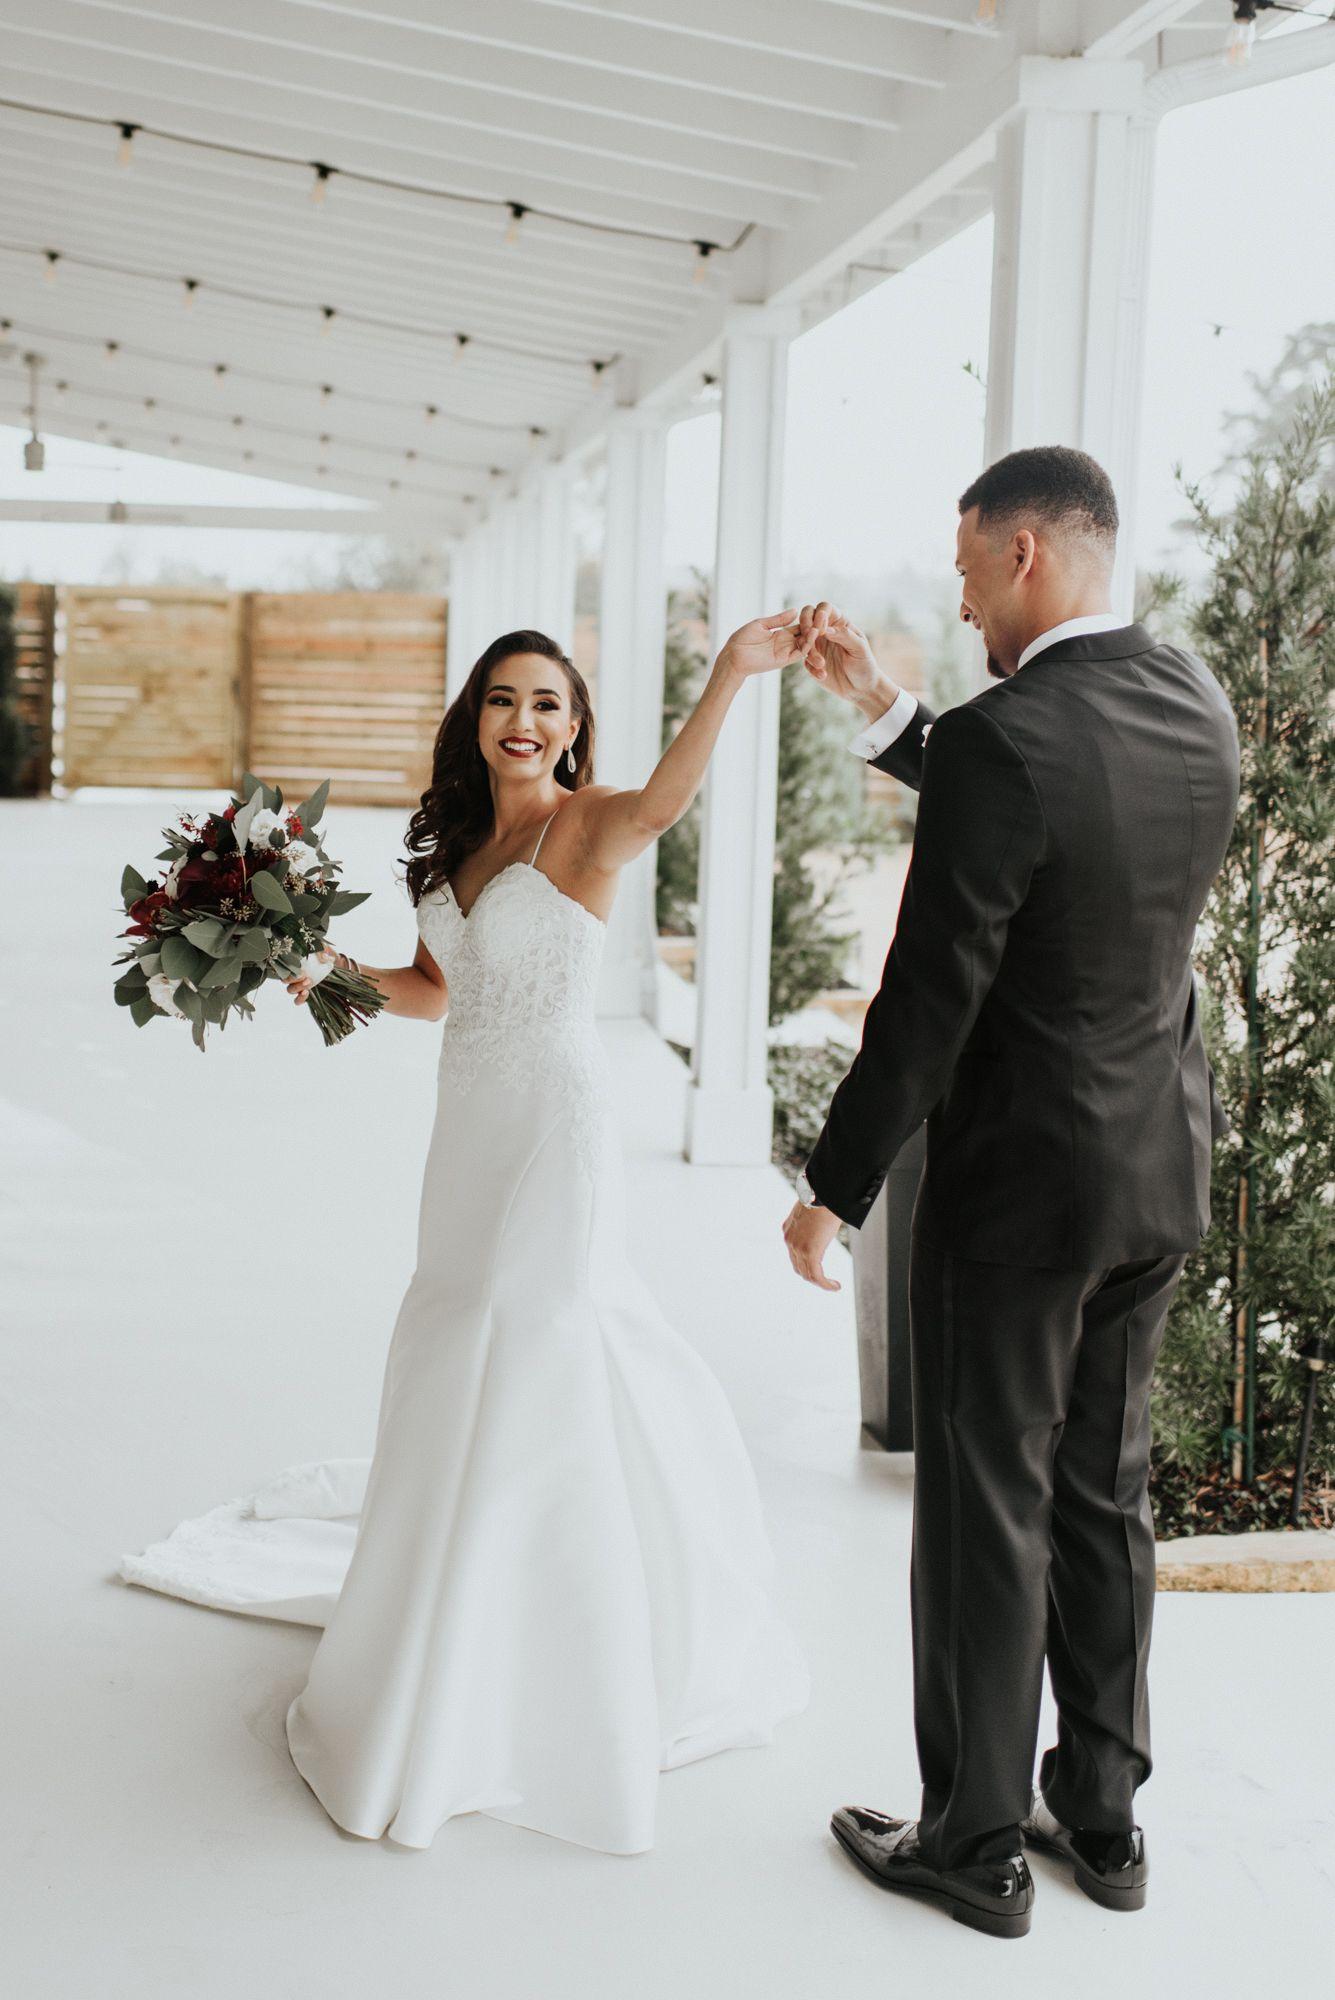 Intimate Destination Wedding Photographer The Farmhouse In Houston TX